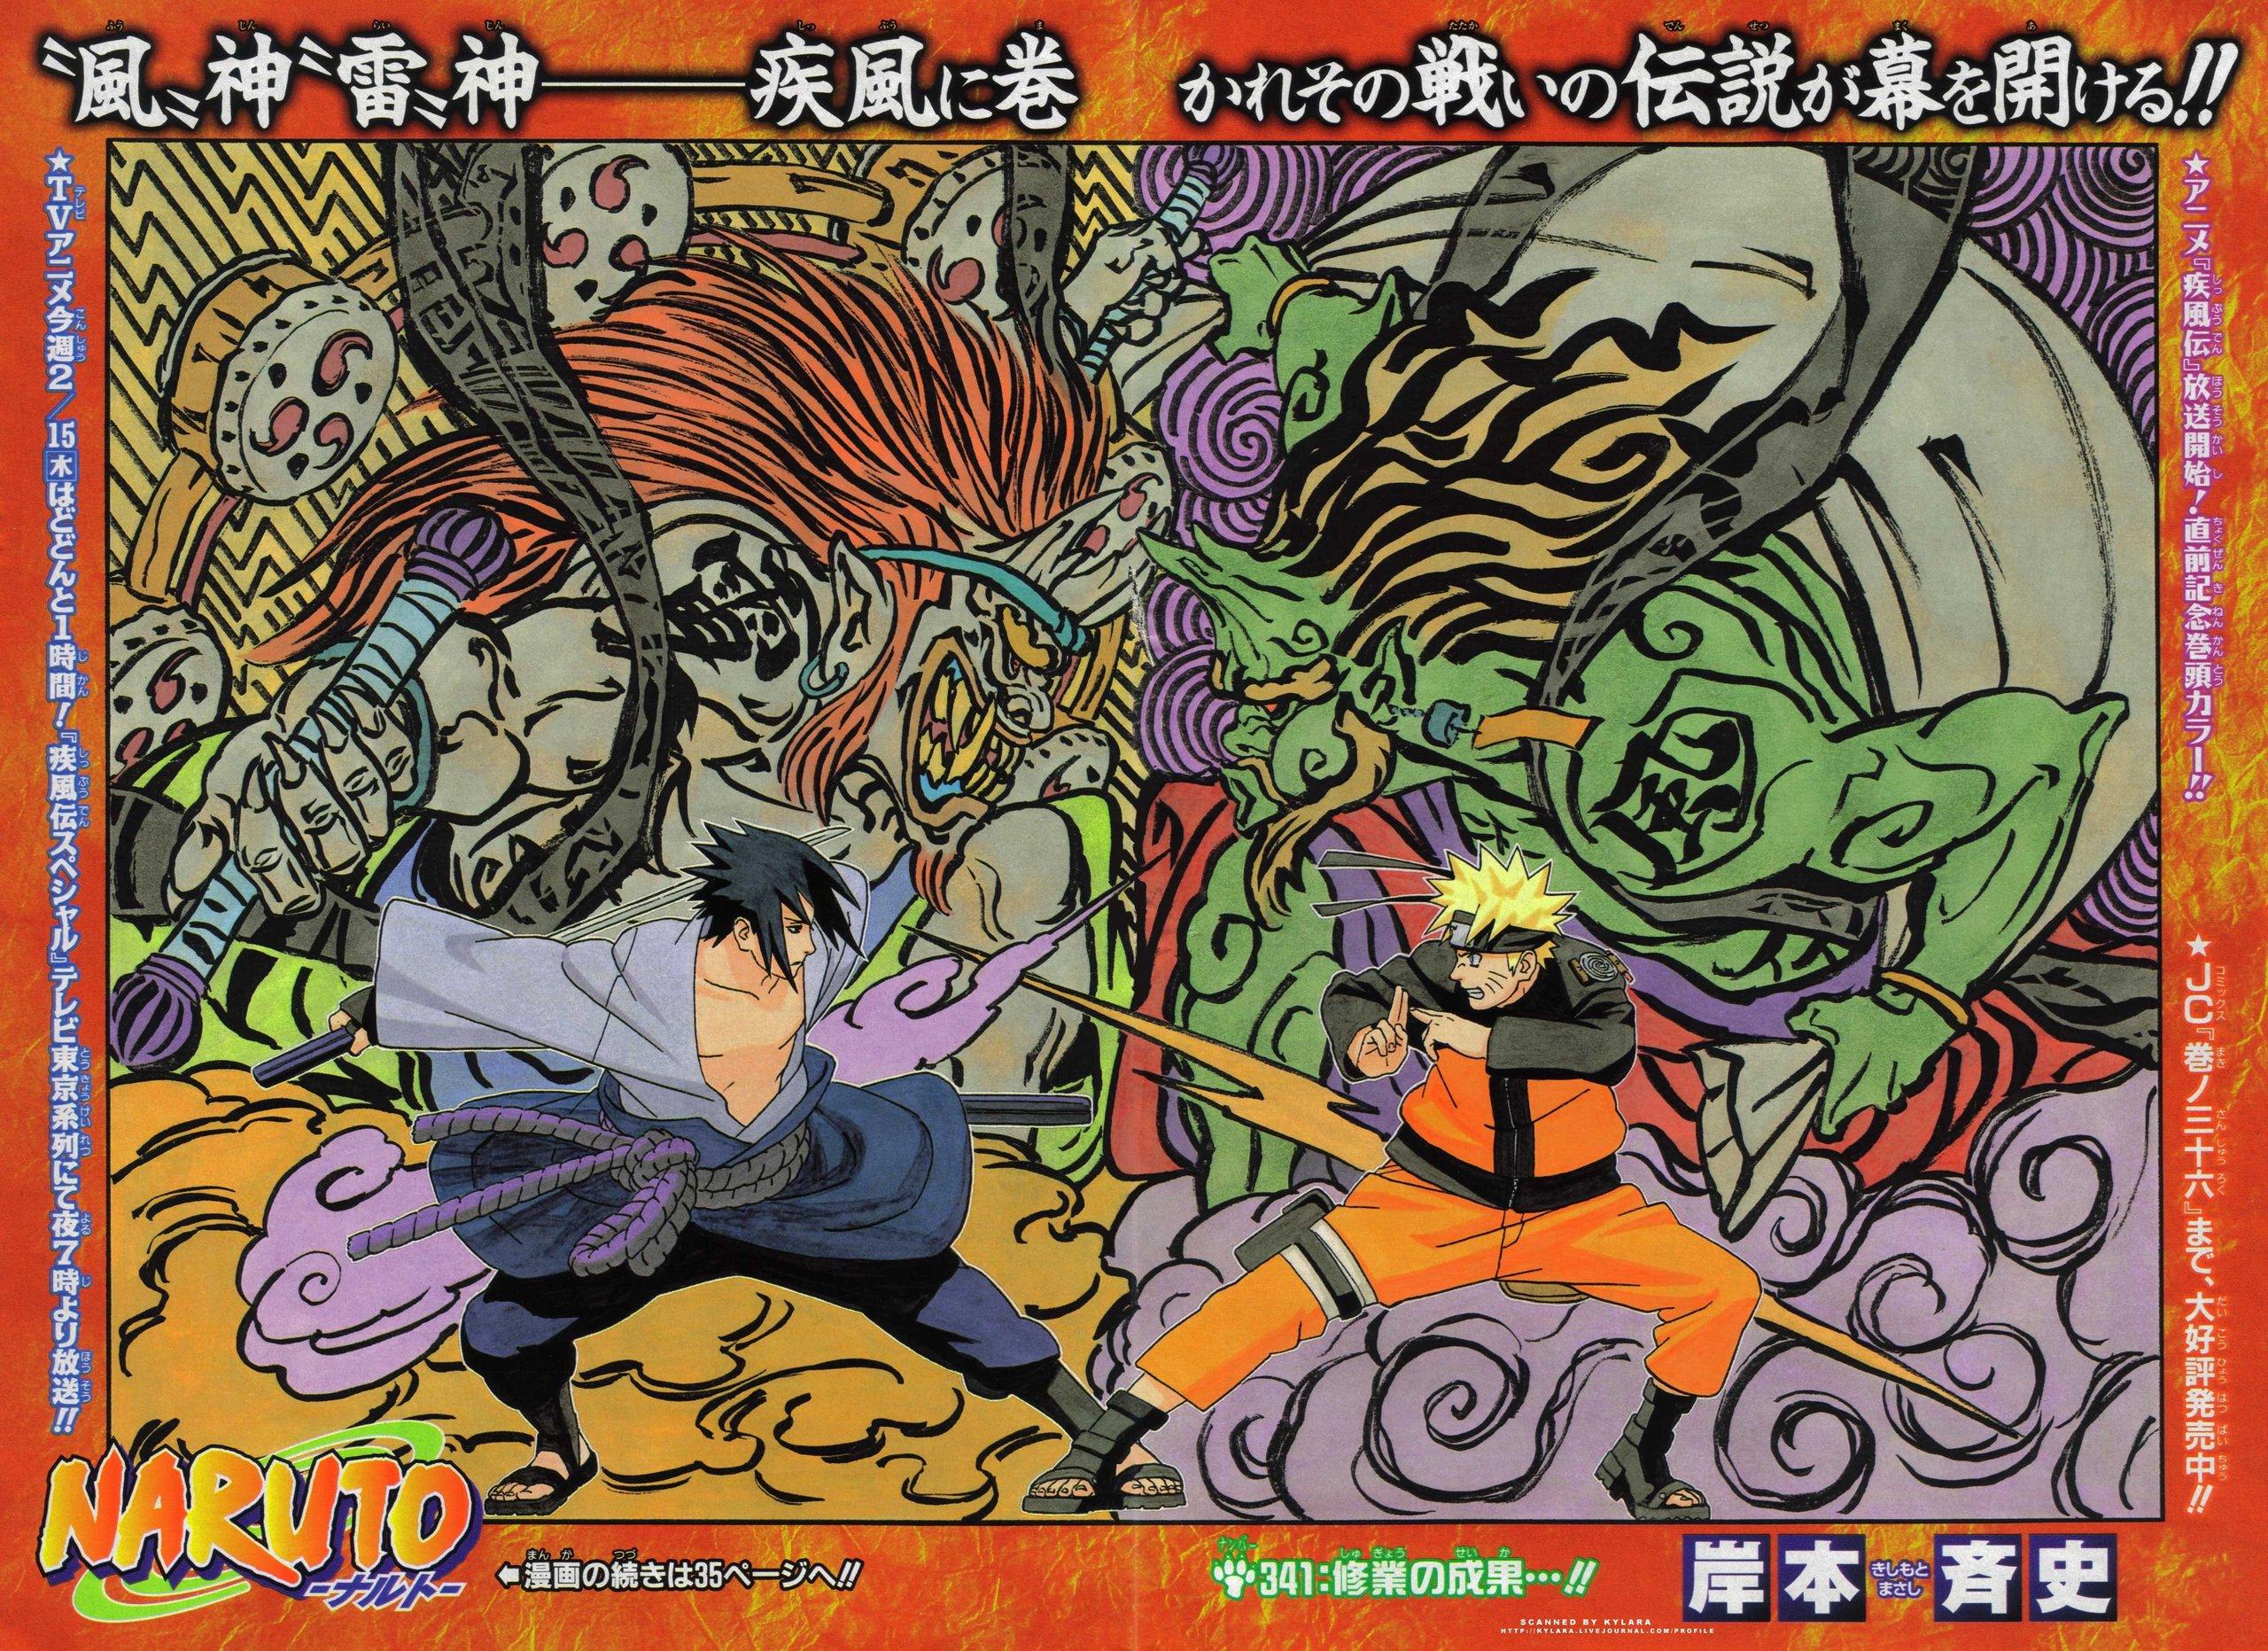 naruto wallpapers for ps vita #11